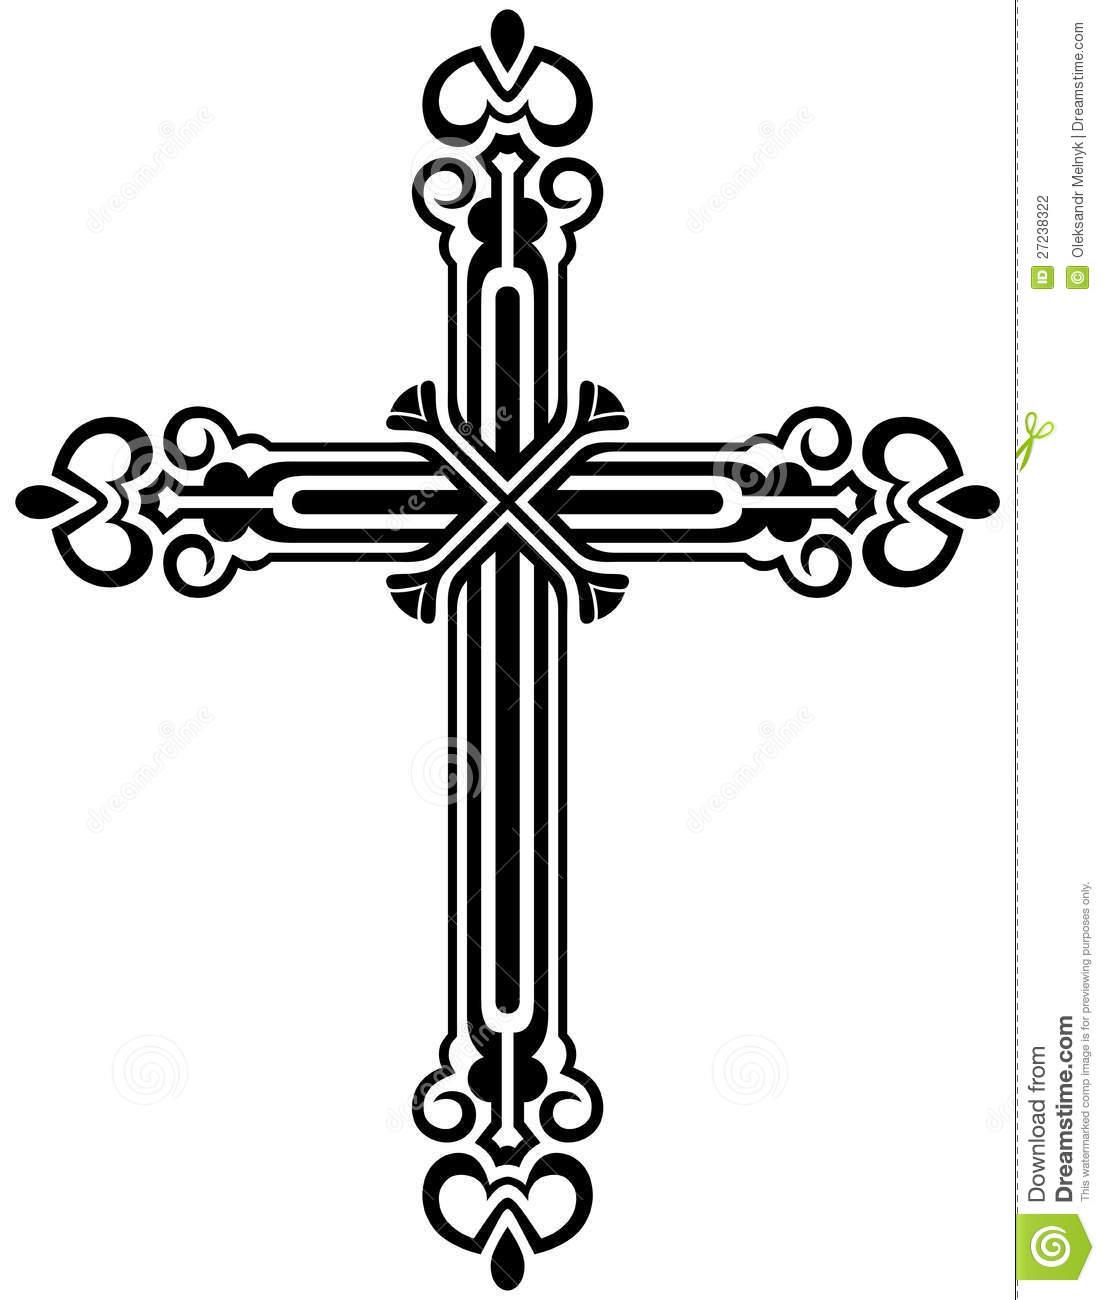 Crucifix Clipart Black And White Clipart Panda